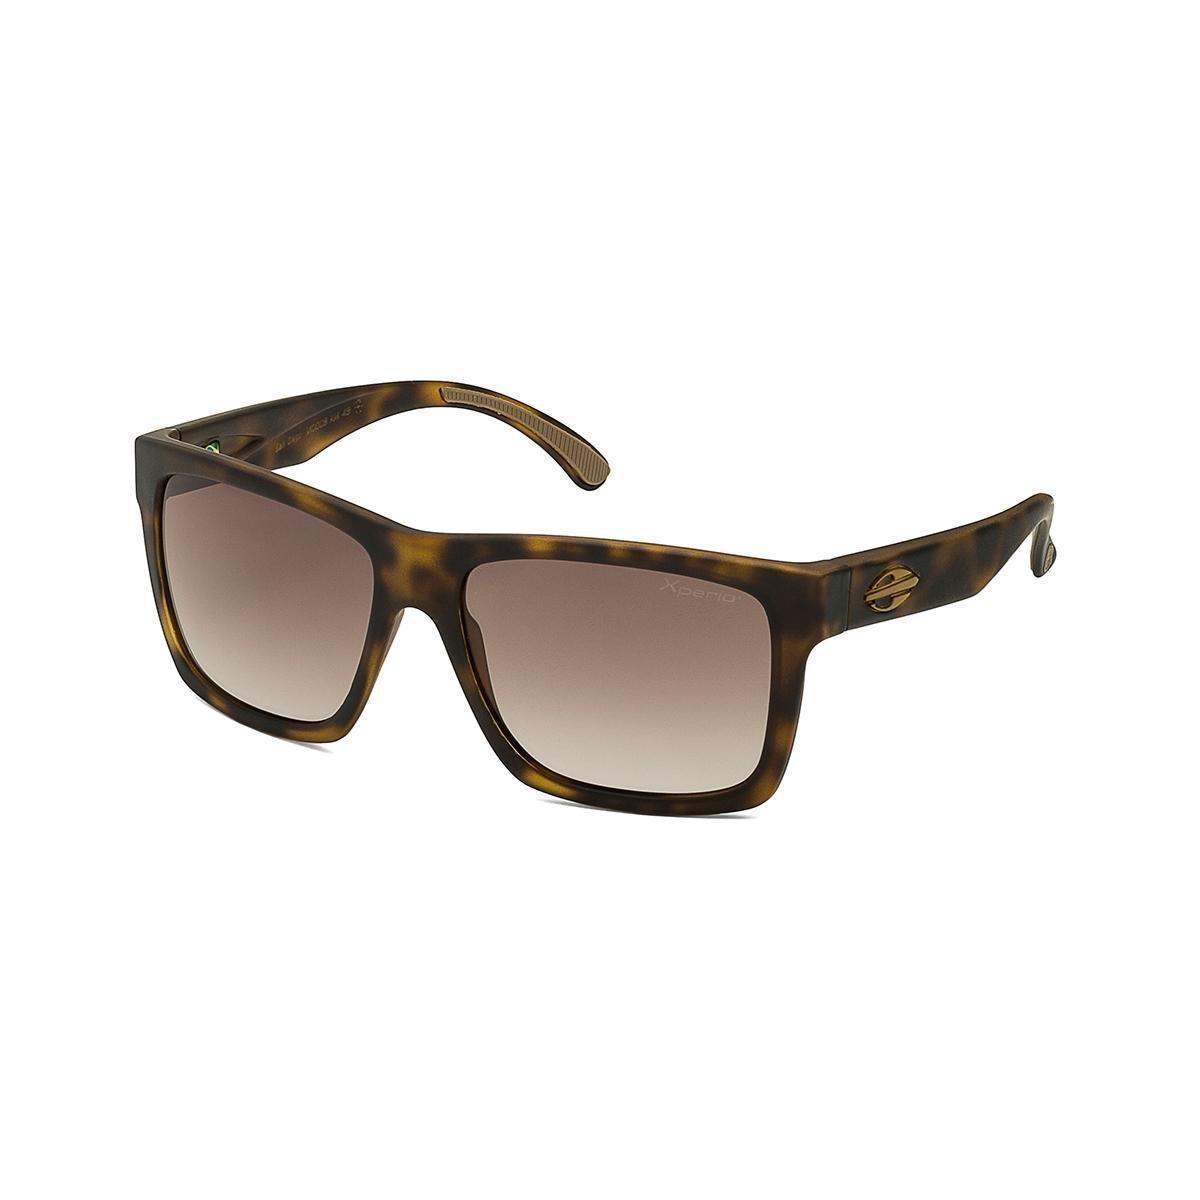 87bb96a6772b5 Oculos Sol Mormaii San Diego - Marrom - Compre Agora